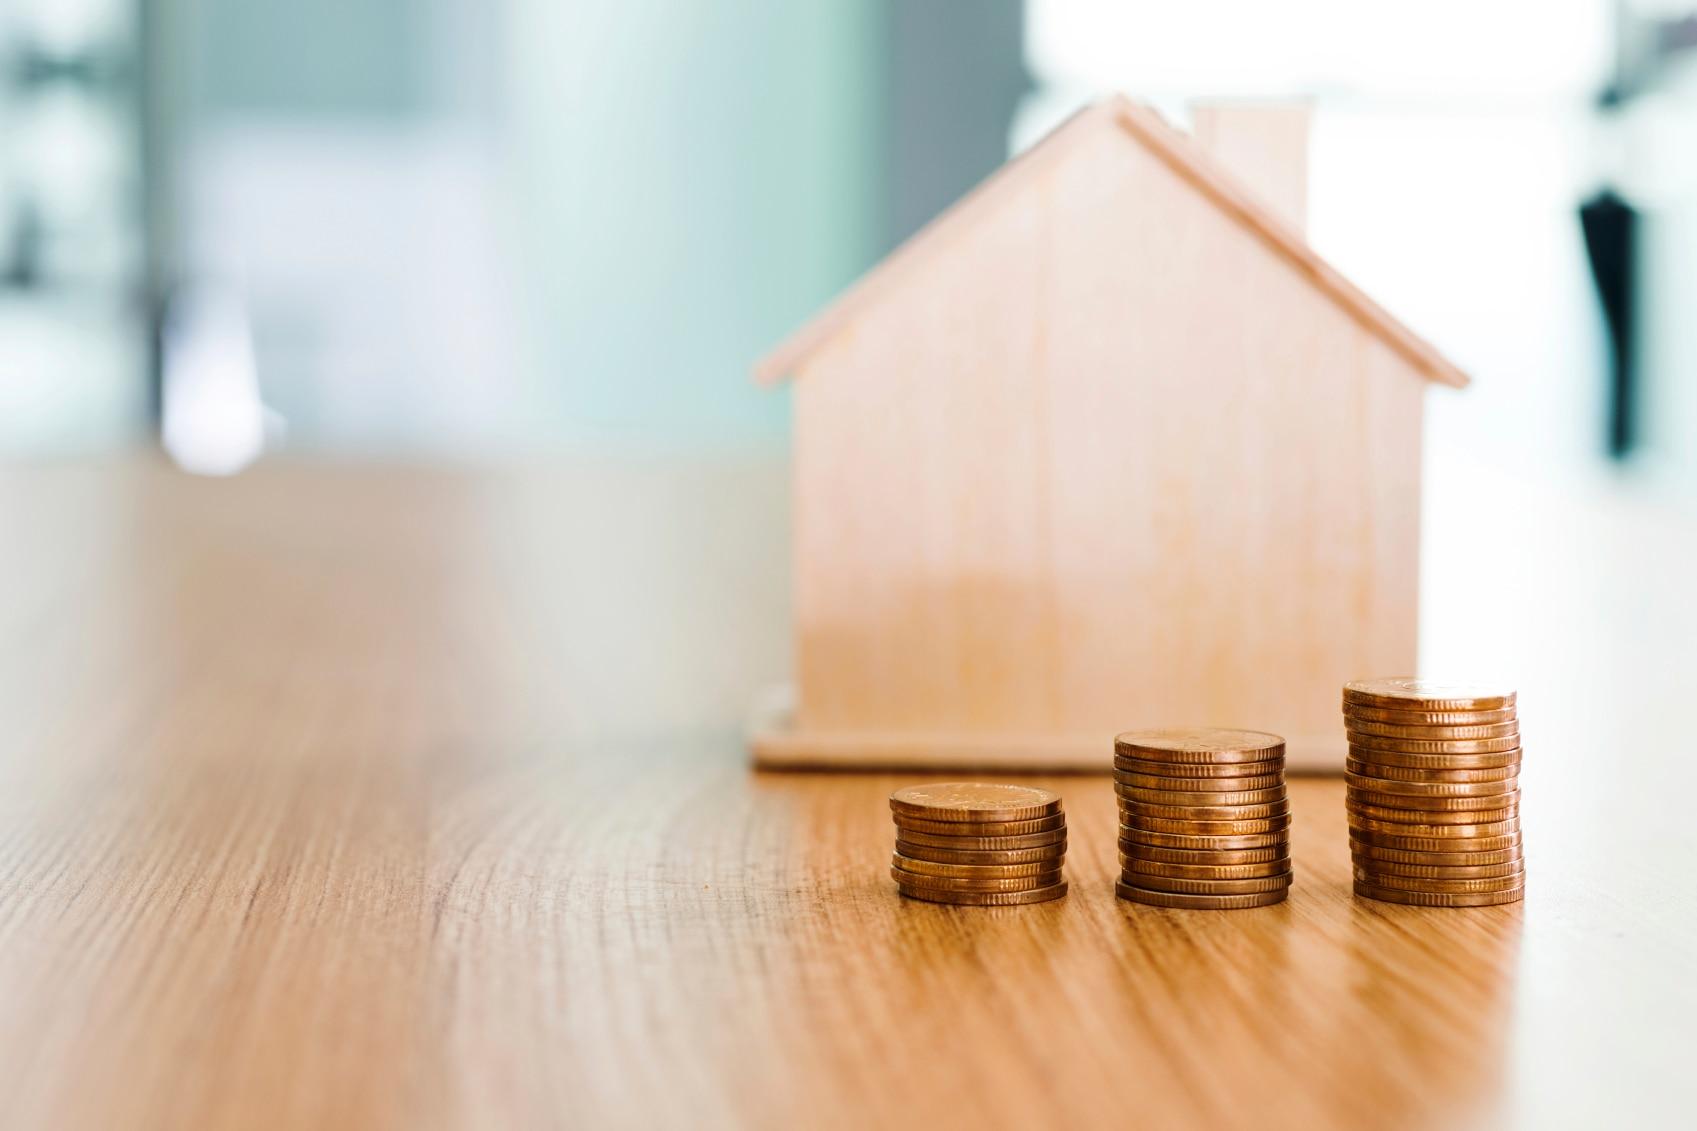 House coins vivienda hipoteca recurso bbva moneda credito hipotecario